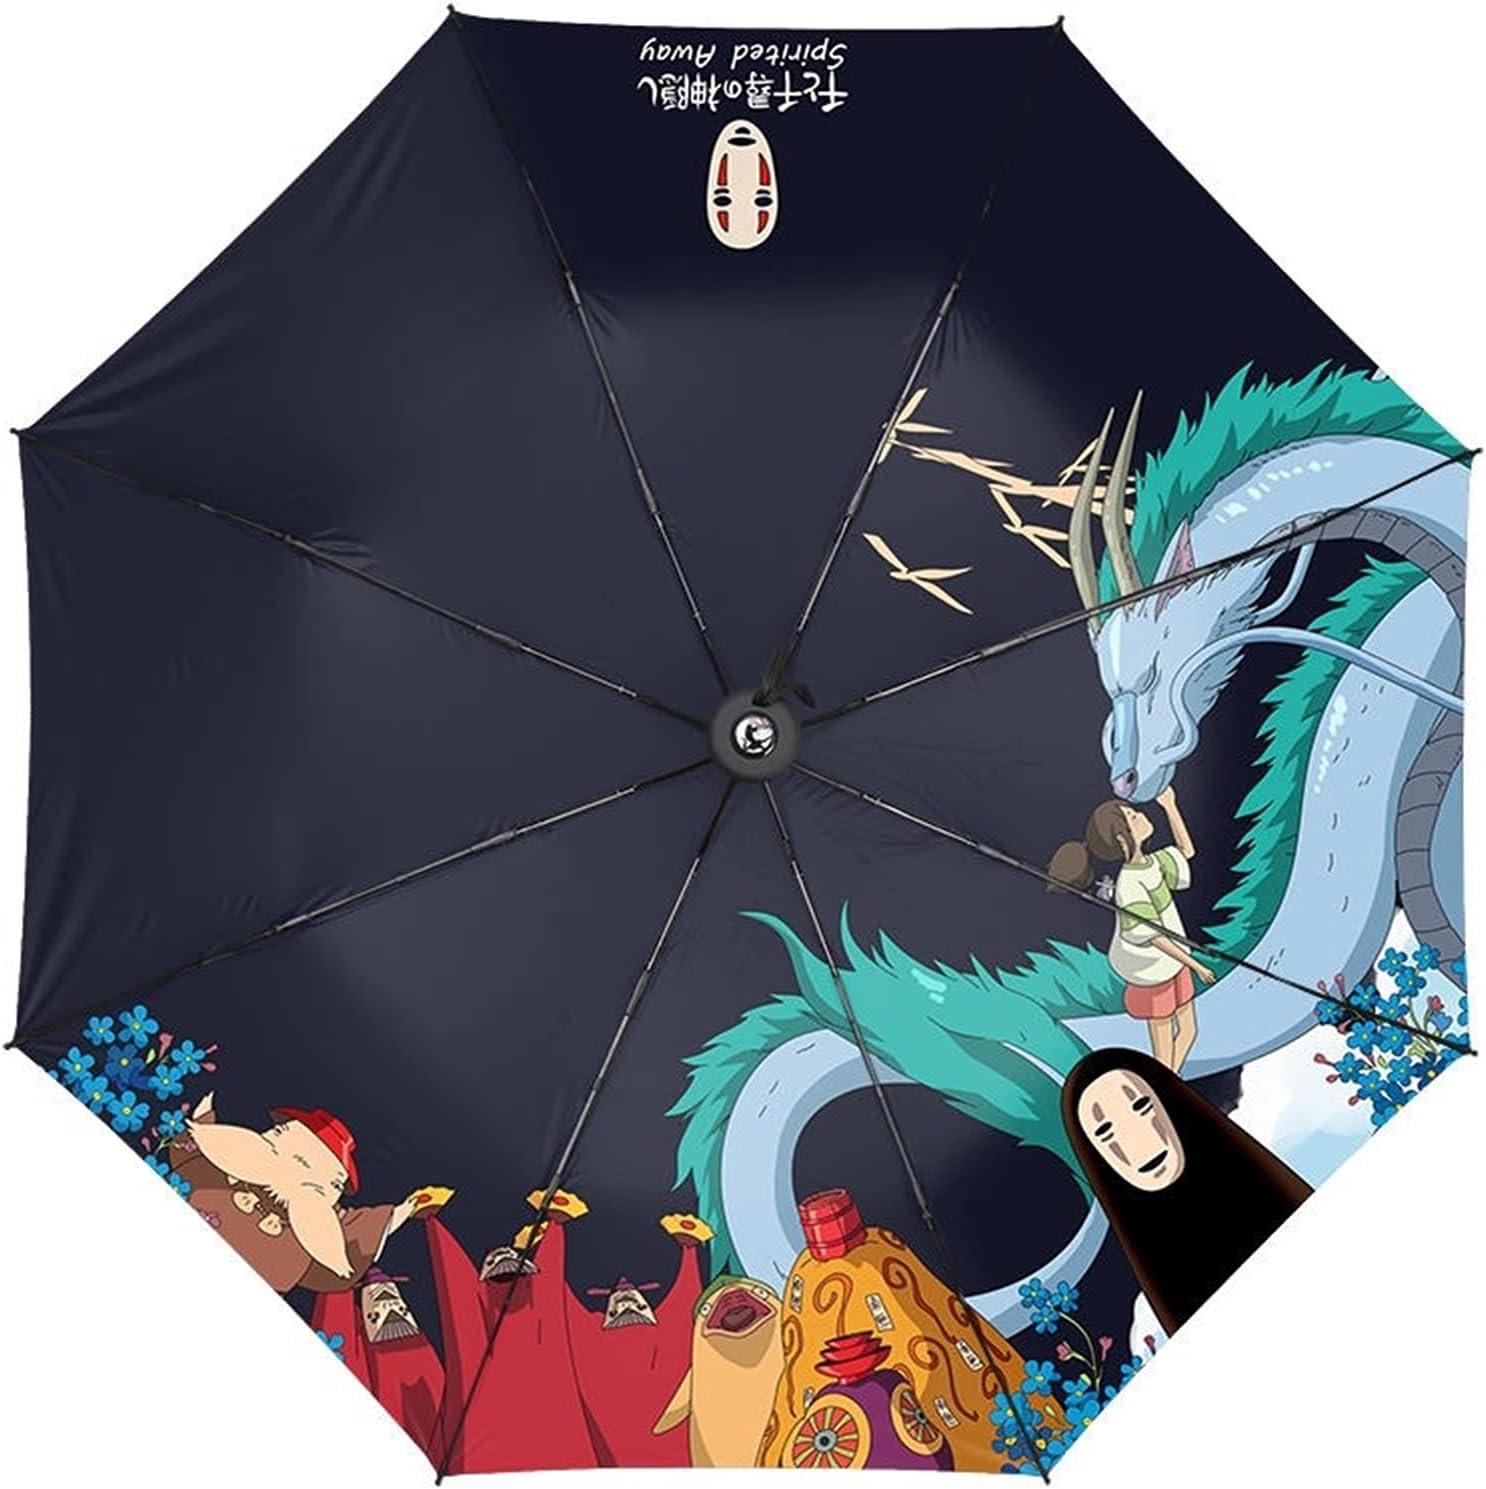 LUBINGT Folding Umbrella Super beauty product restock quality Cheap sale top Anime Spirited Away Umbrel Prop Cosplay